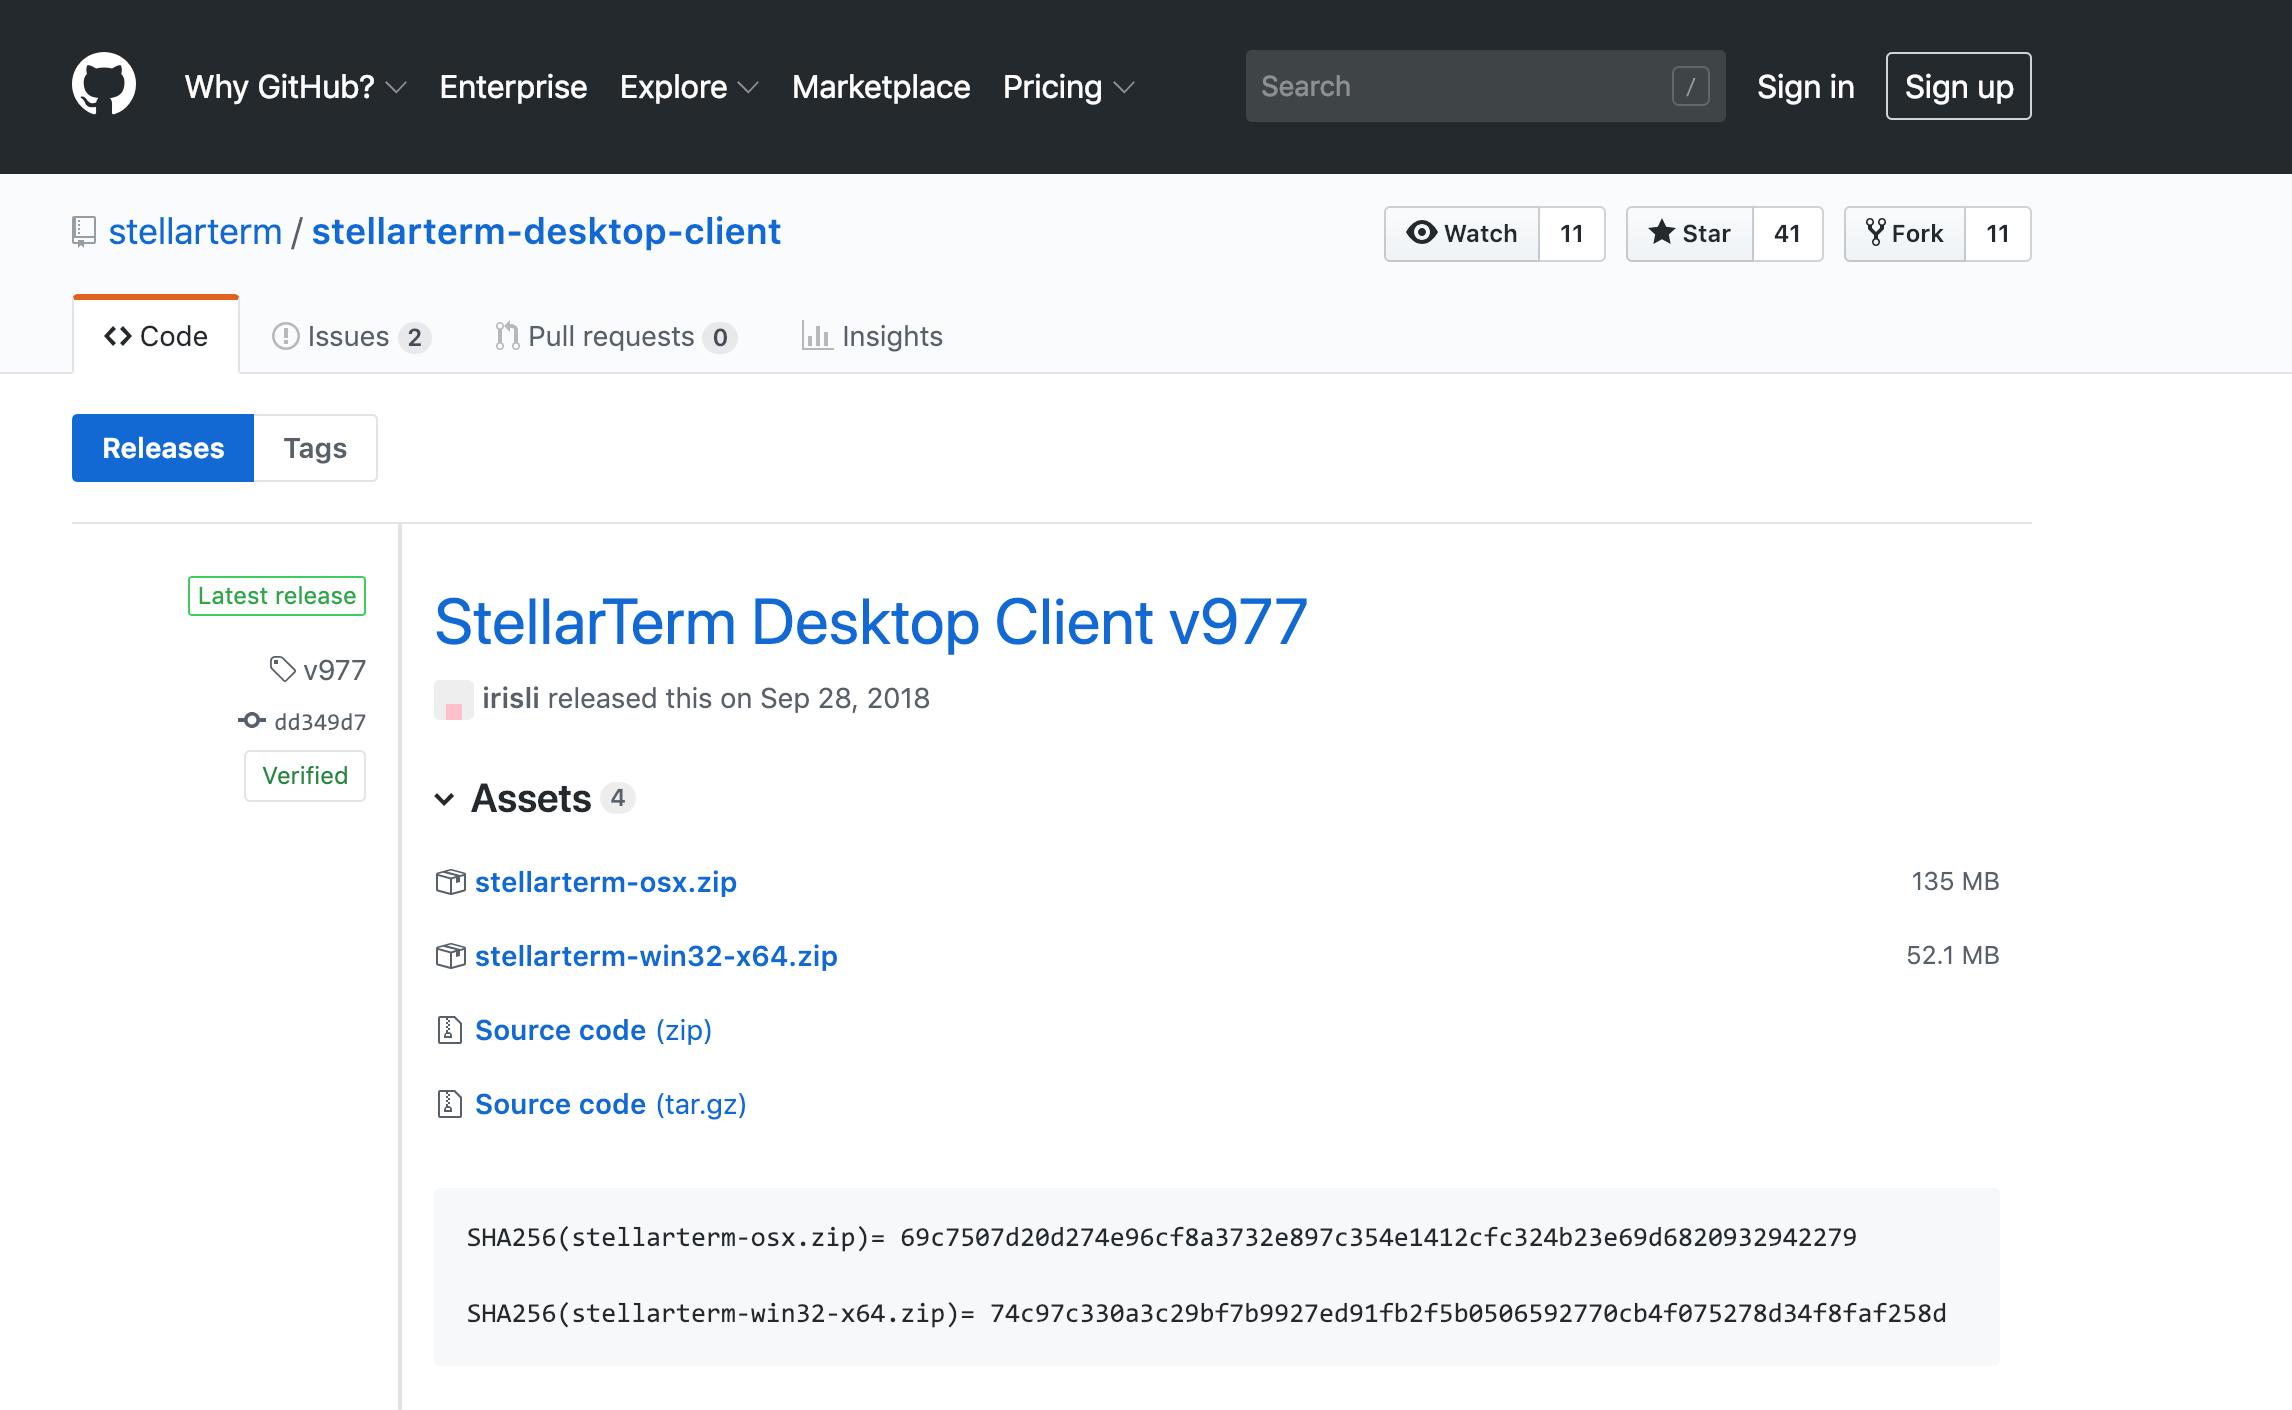 StellarTerm Desktop Client v977